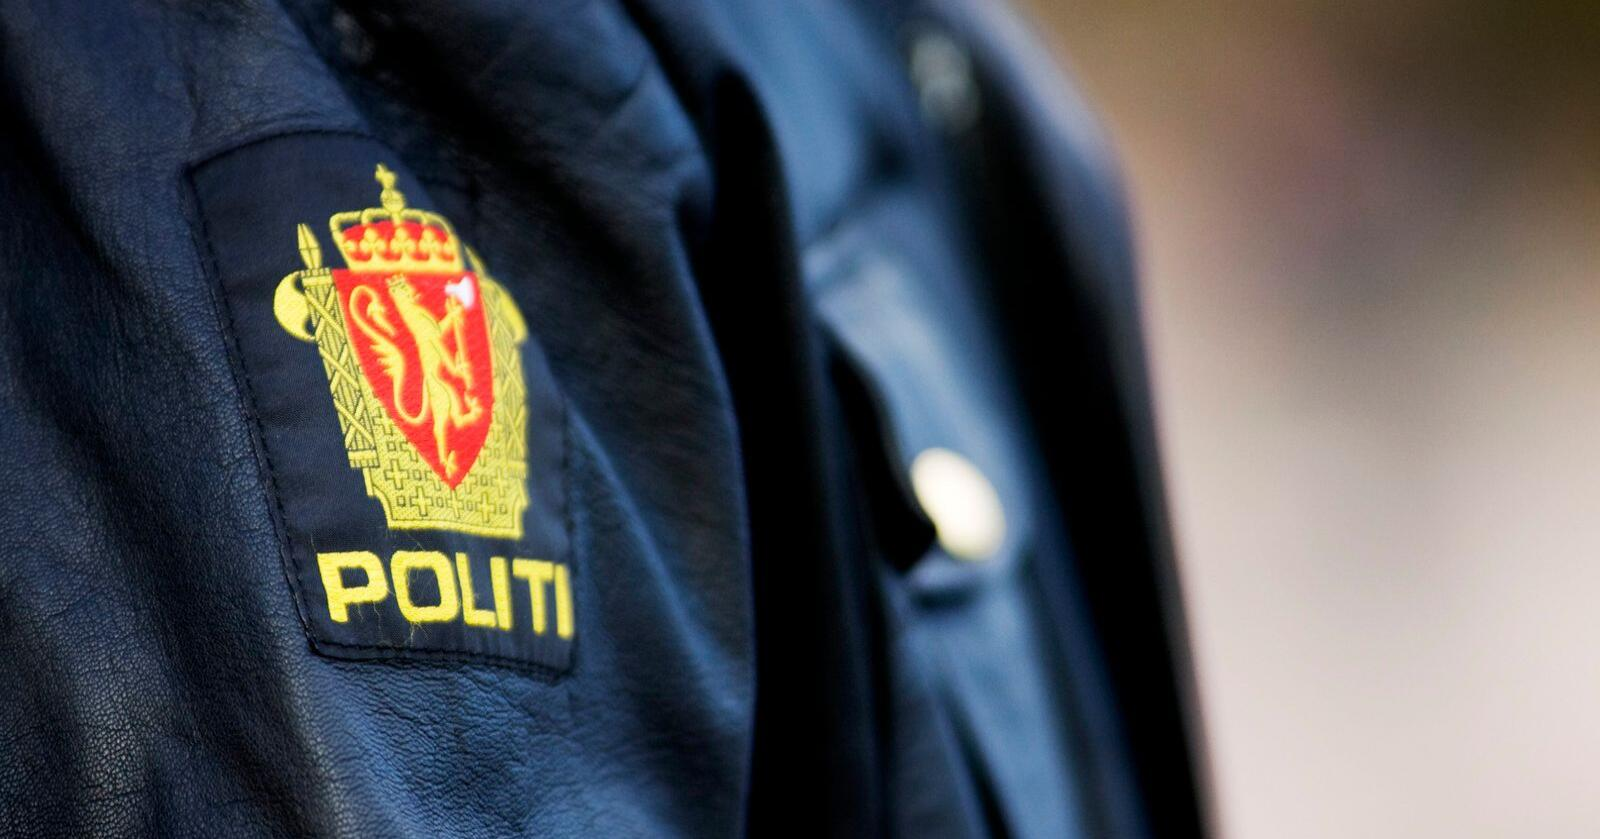 En politimann i sin uniform med symbolet for det norske politi torsdag ettermiddag i Oslo. Foto: Kyrre Lien / NTB